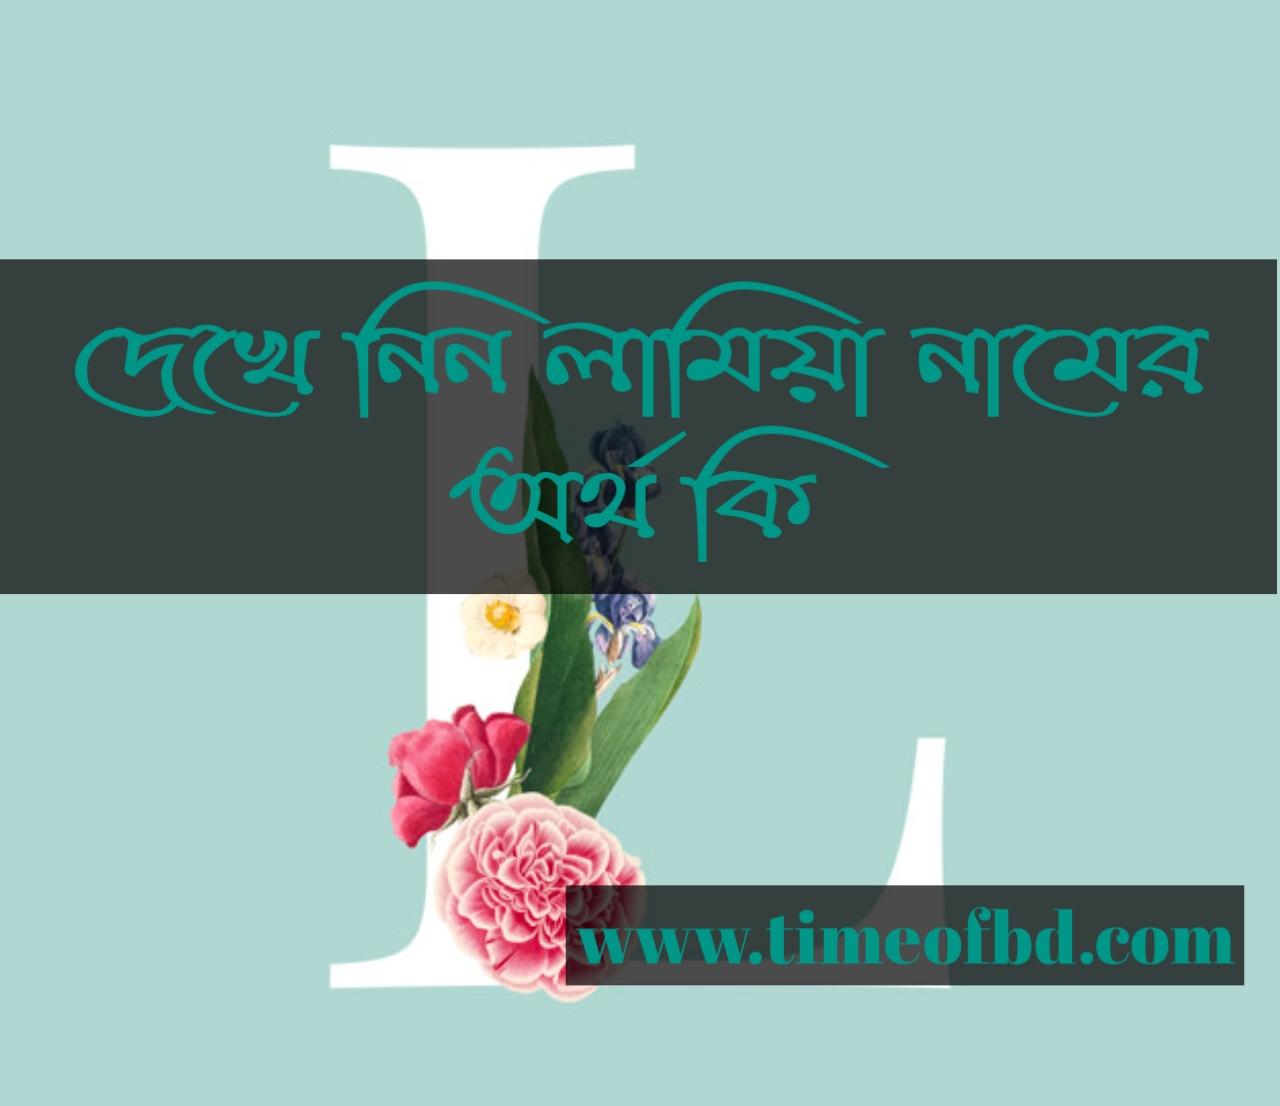 Lamiya name meaning in Bengali, লামিয়া নামের অর্থ কি, লামিয়া নামের বাংলা অর্থ কি, লামিয়া নামের ইসলামিক অর্থ কি,